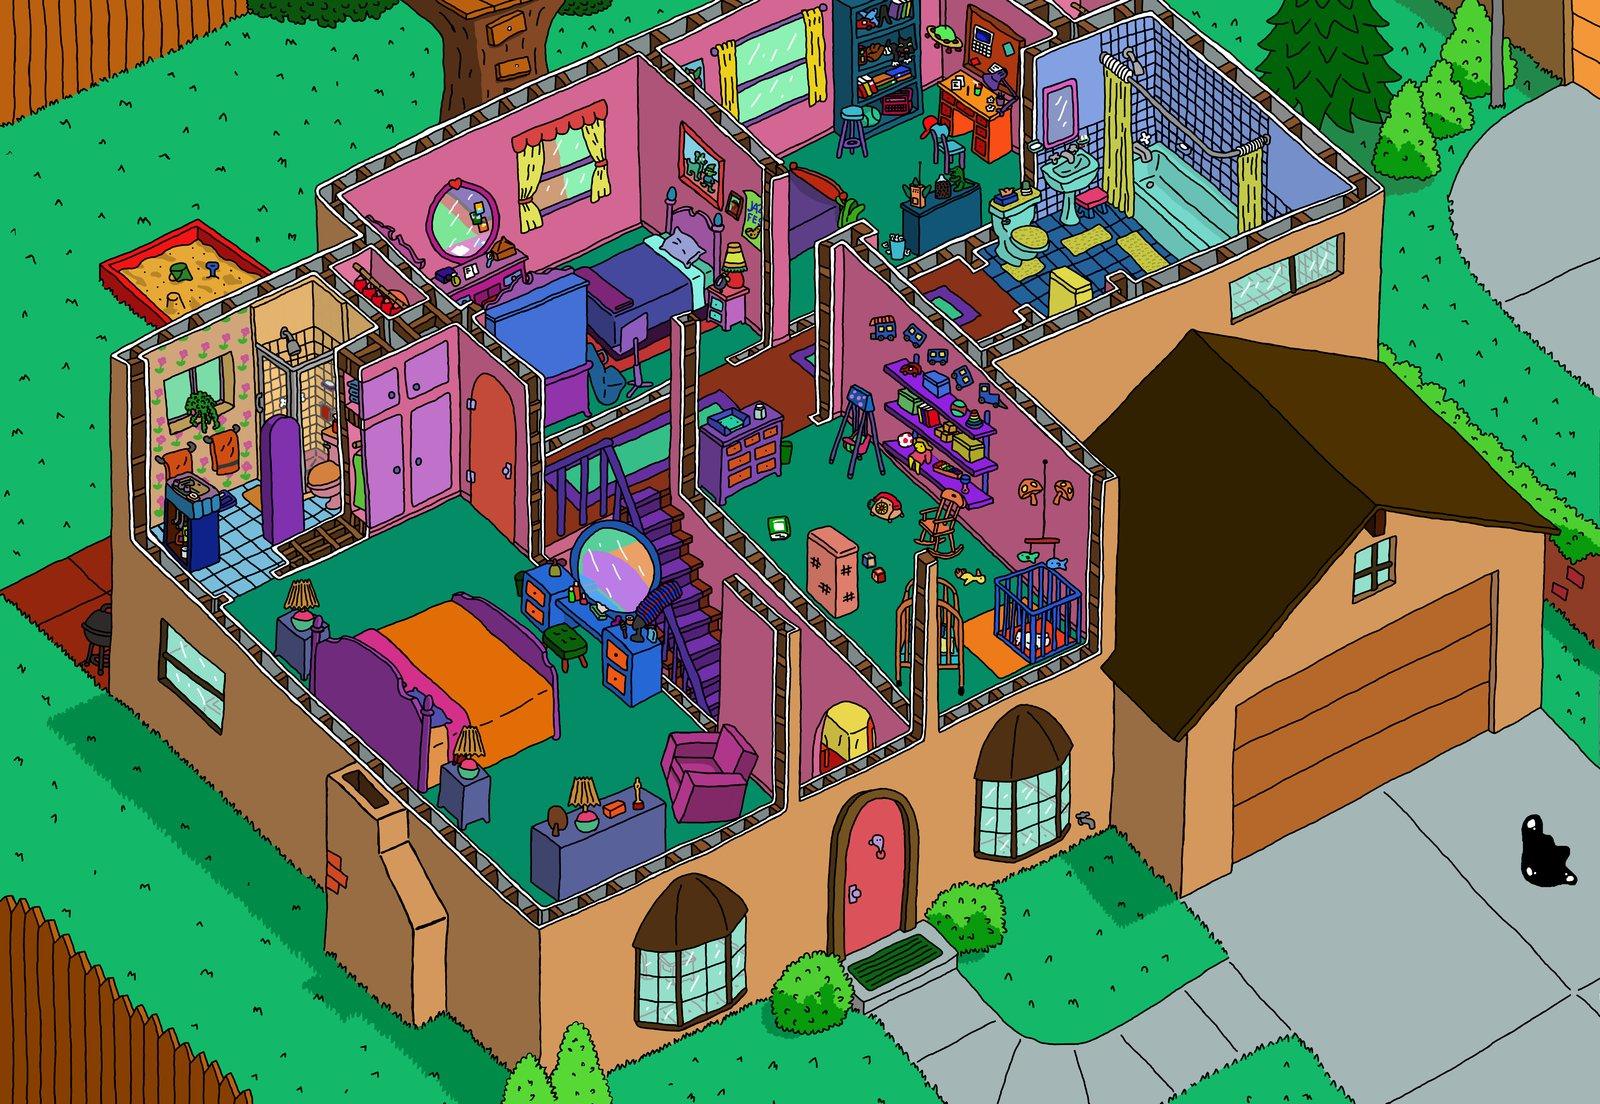 casa-simpsons-segundo-piso.jpg